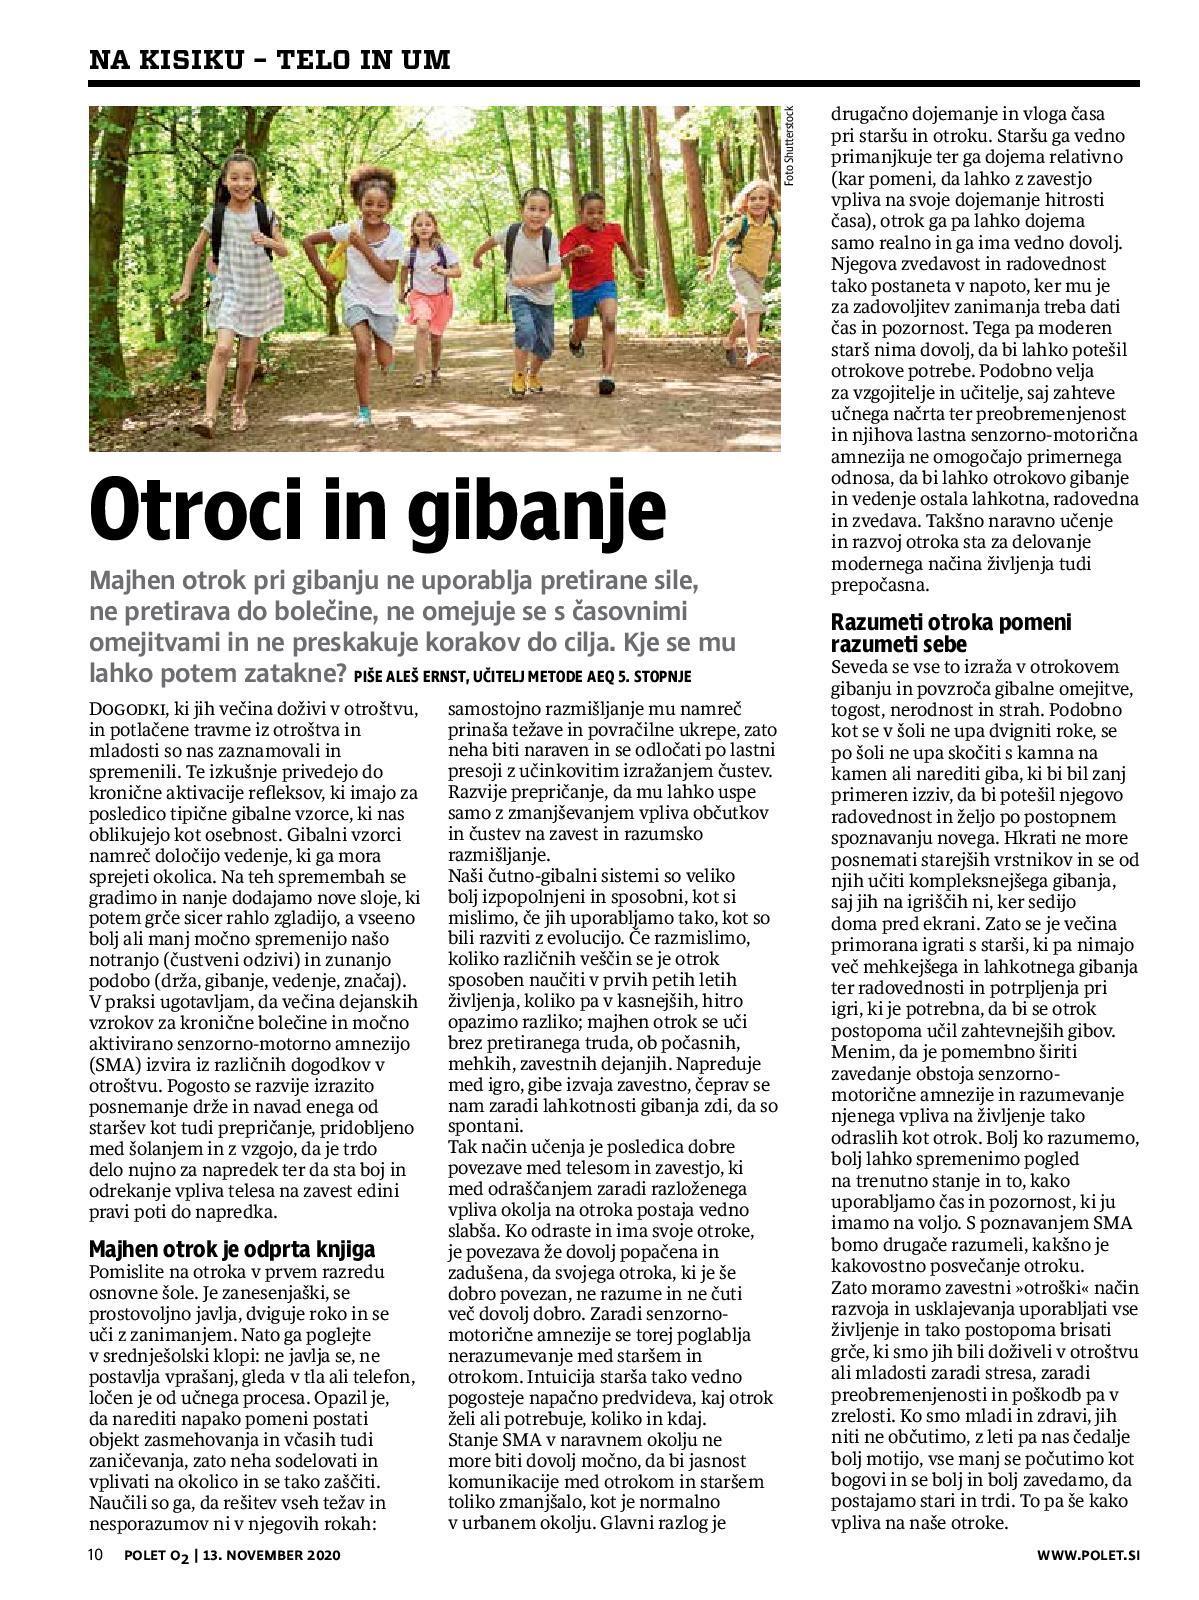 Children and movement